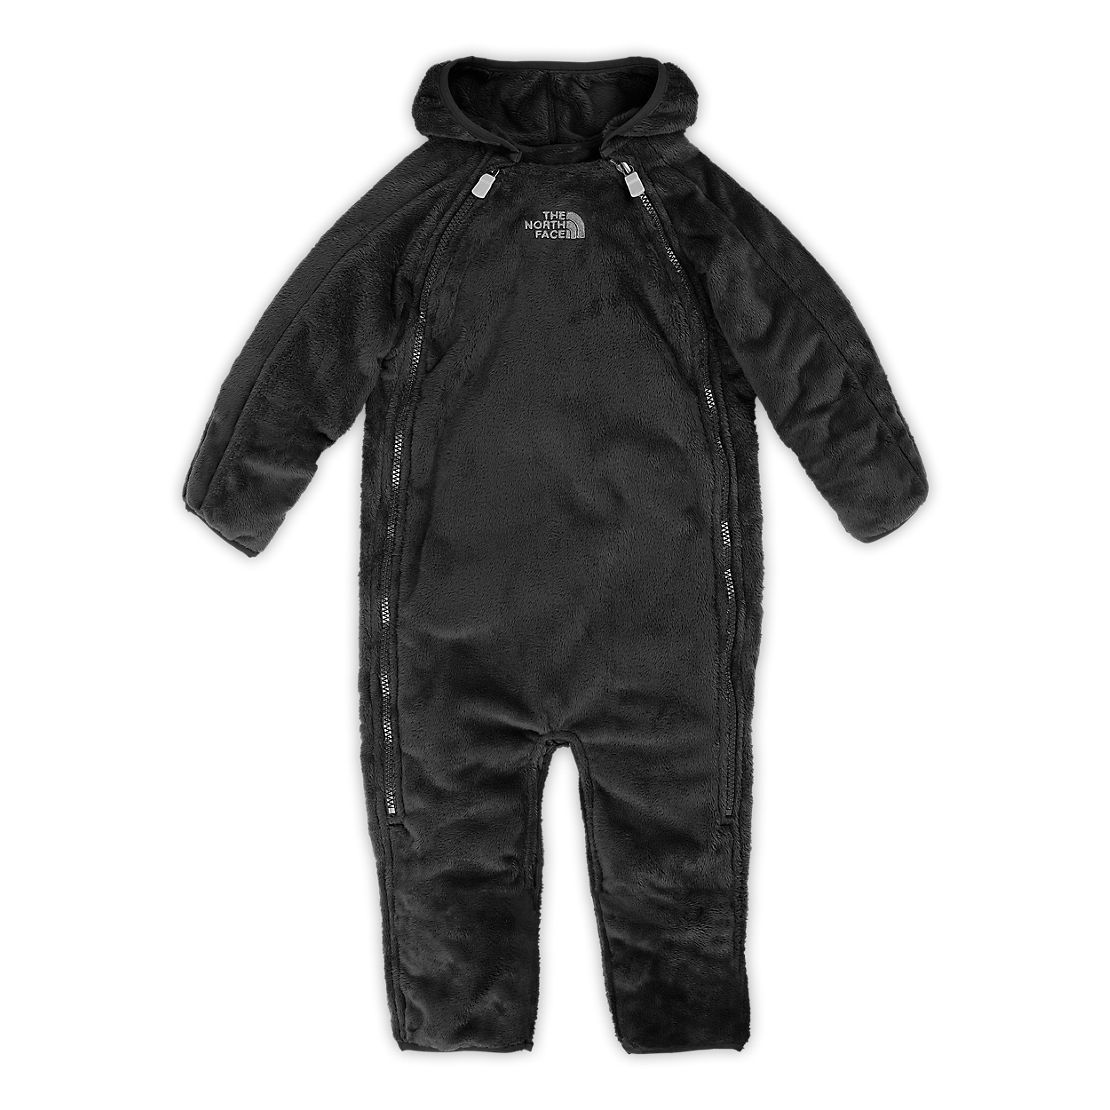 7fbd7a416a63 The North Face Infants  (0M-24M) Jackets   Vests INFANT BUTTERY ...